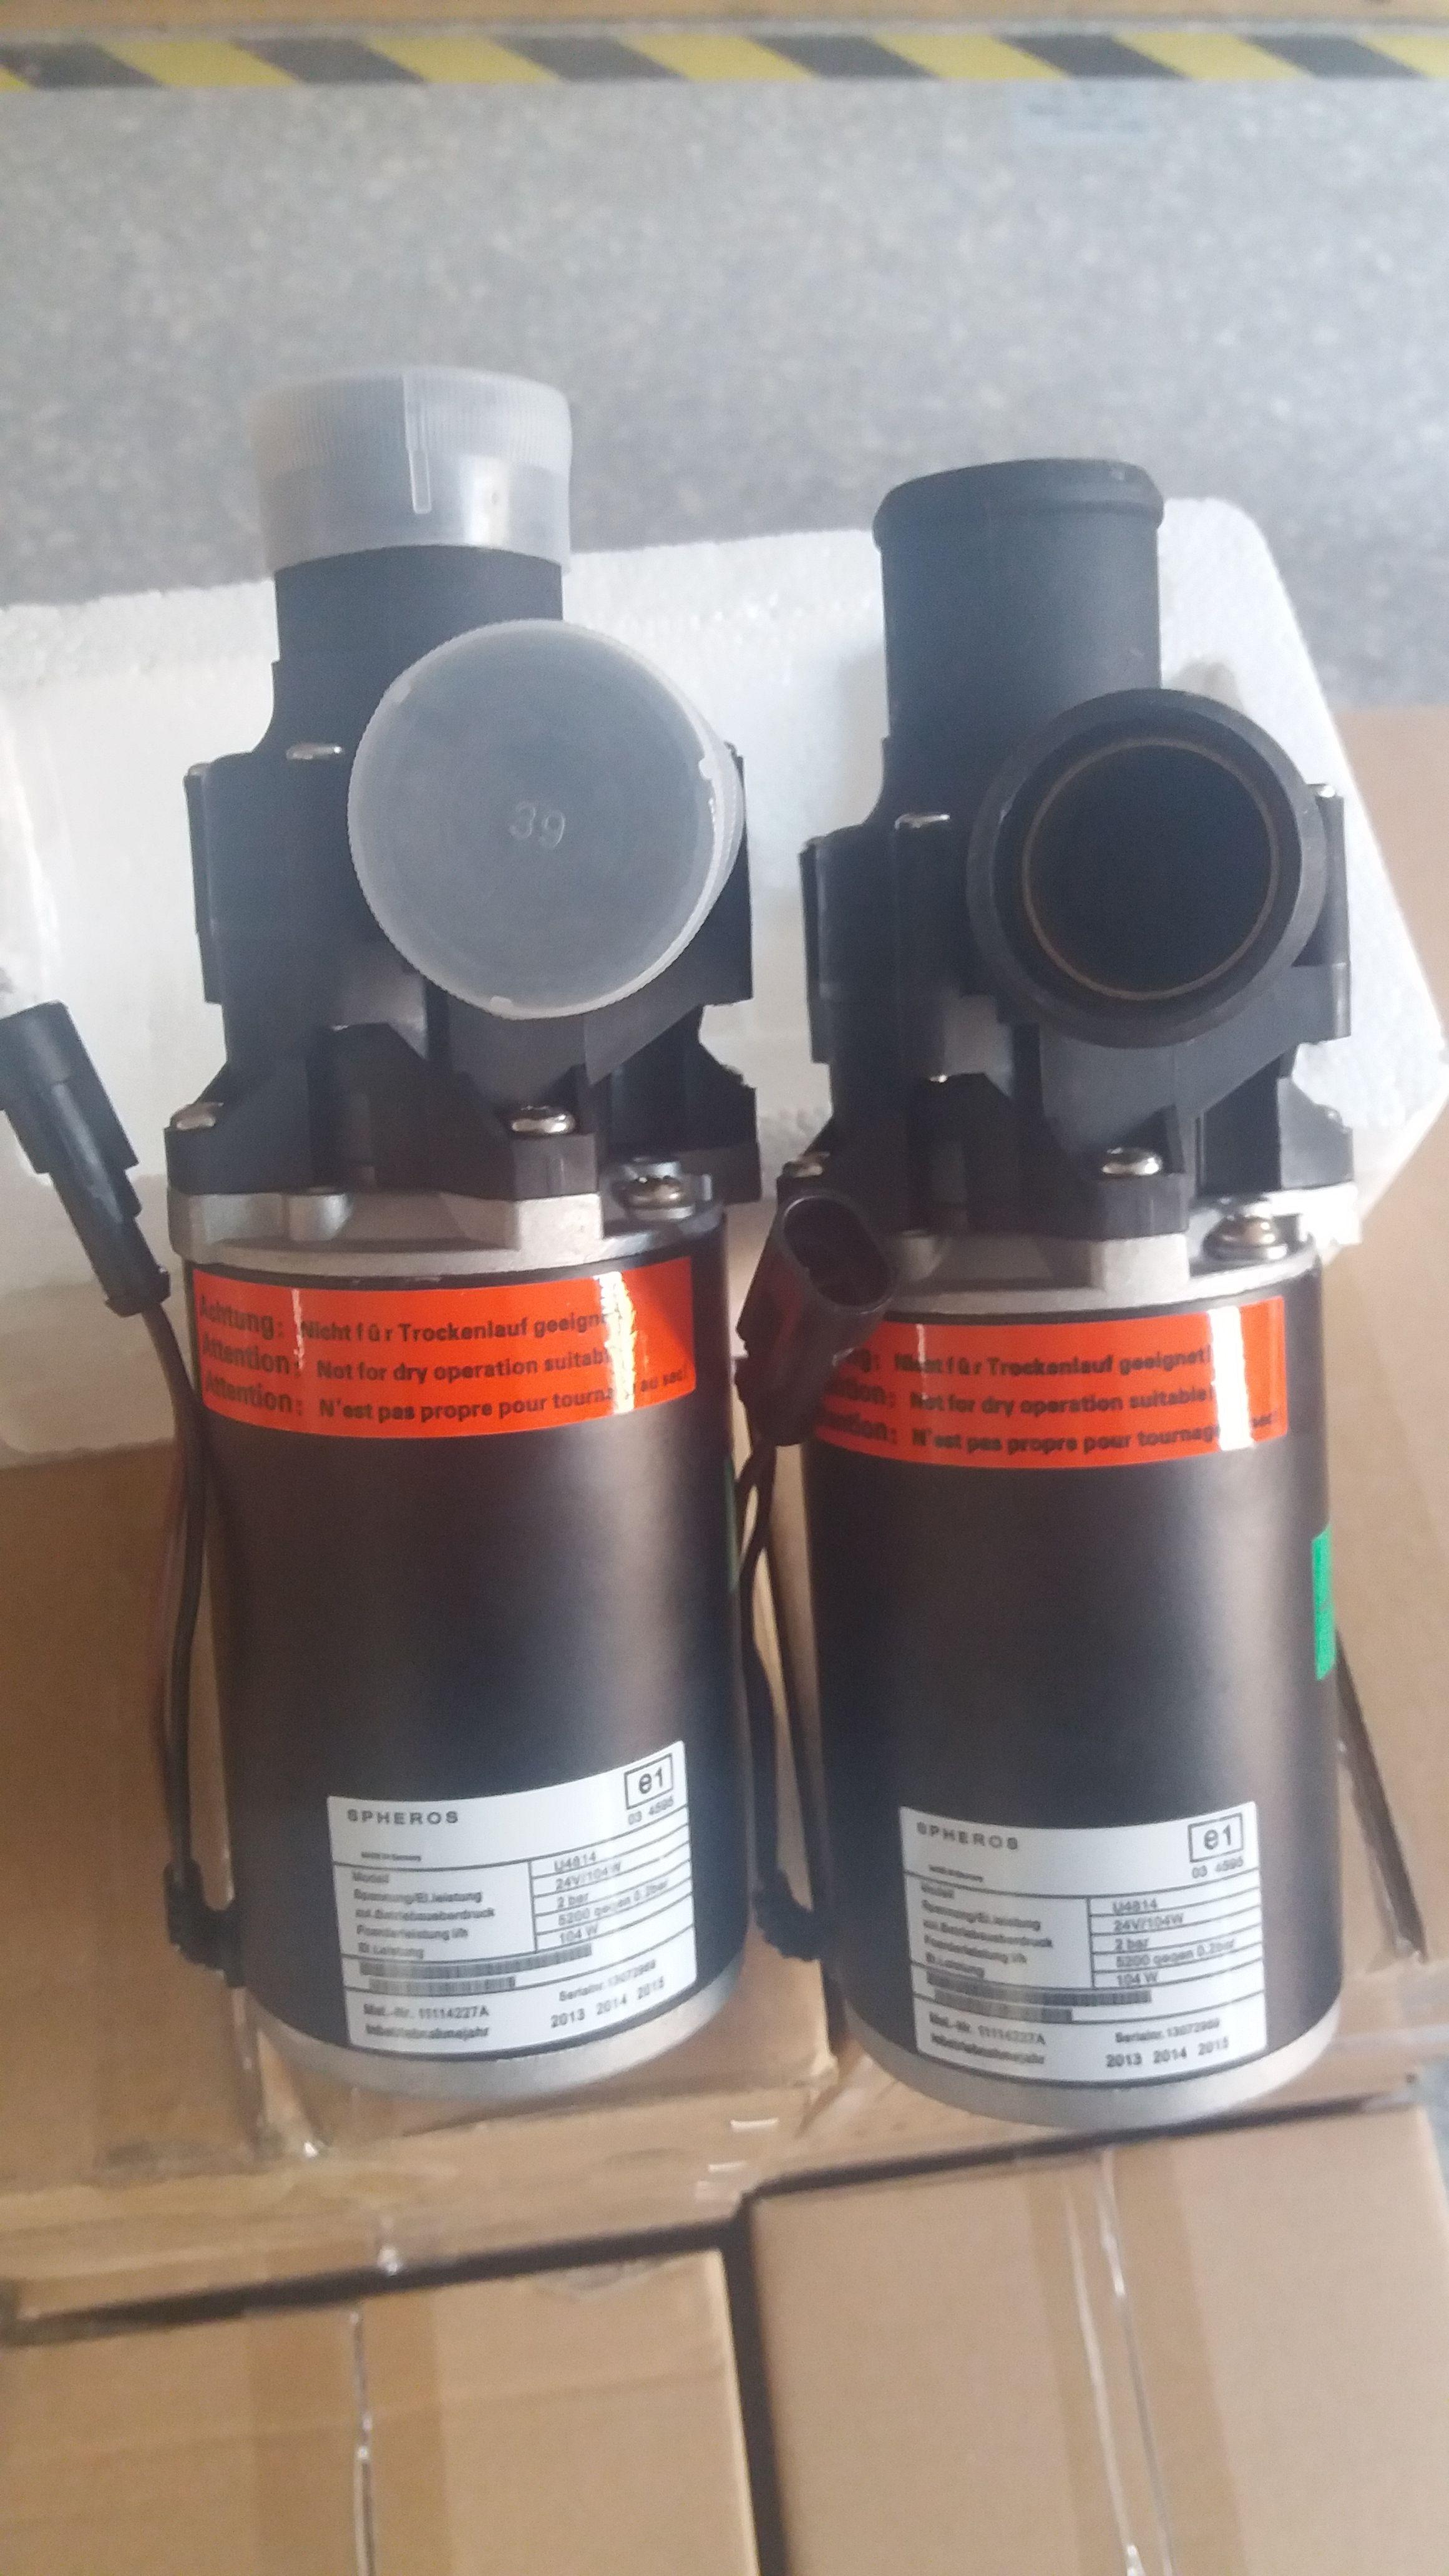 Spheros Water Pump Model No. 4814, 24V/104W,for Yutong Bus